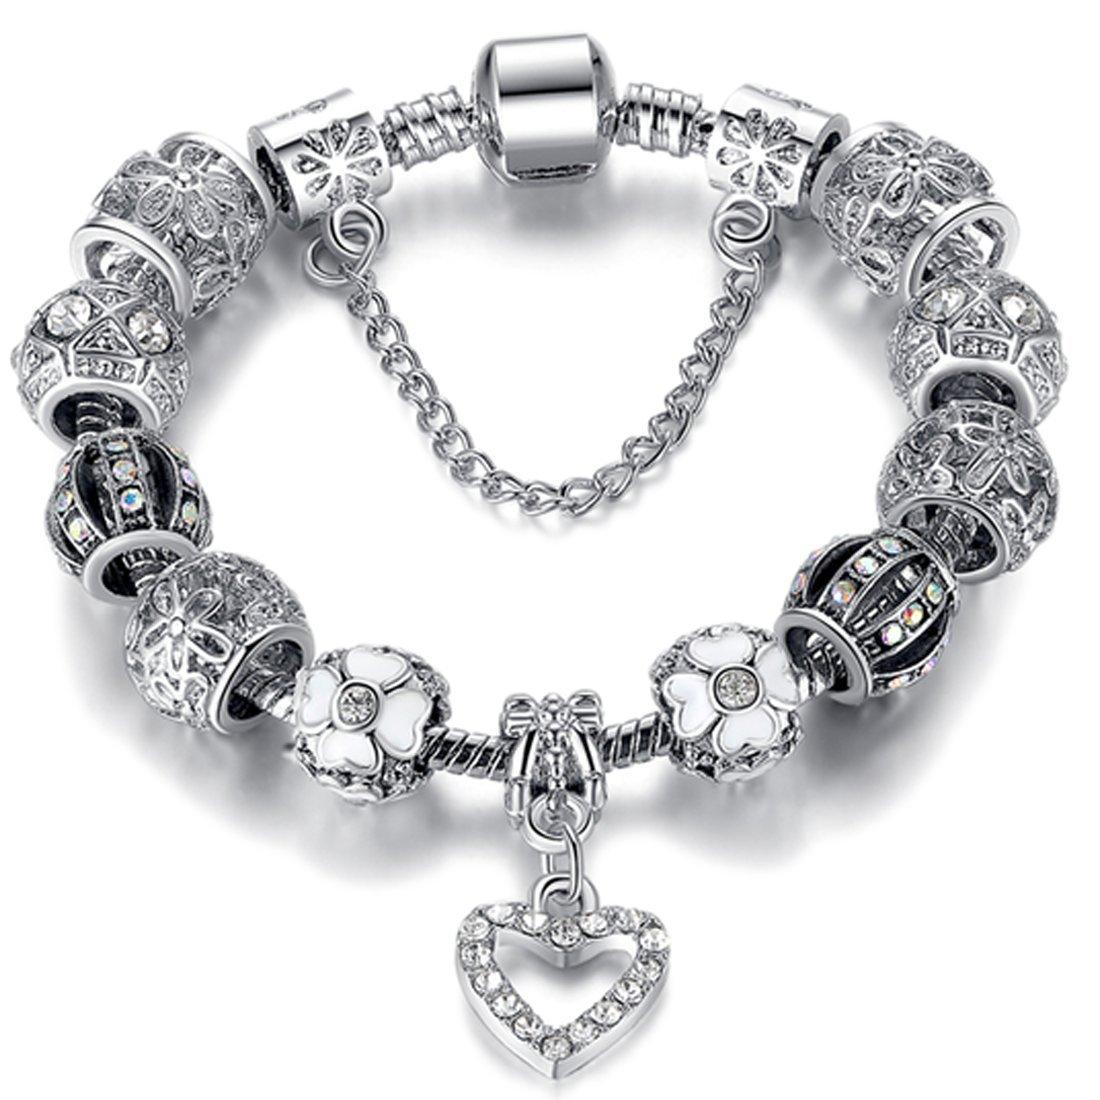 Silver Heart Charm Bracelet Free Ship Deal